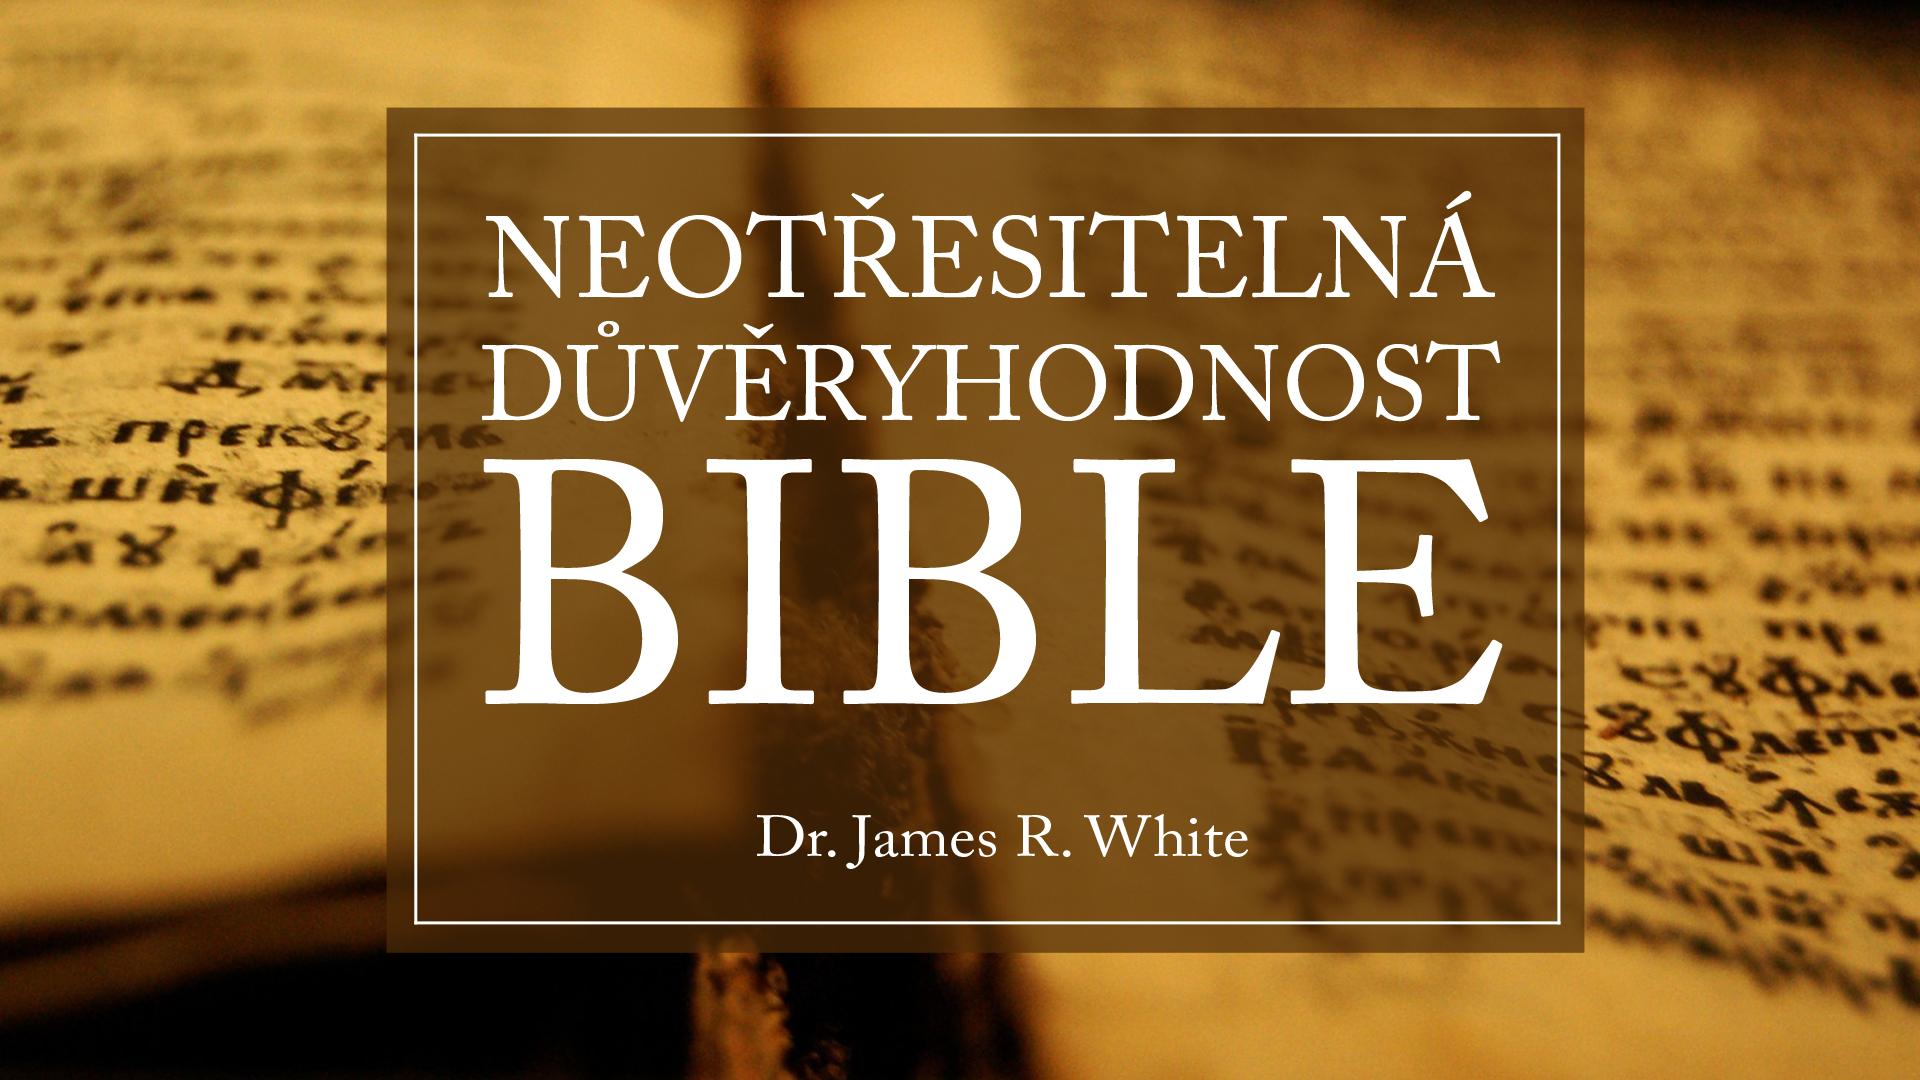 Duveryhodnost Bible